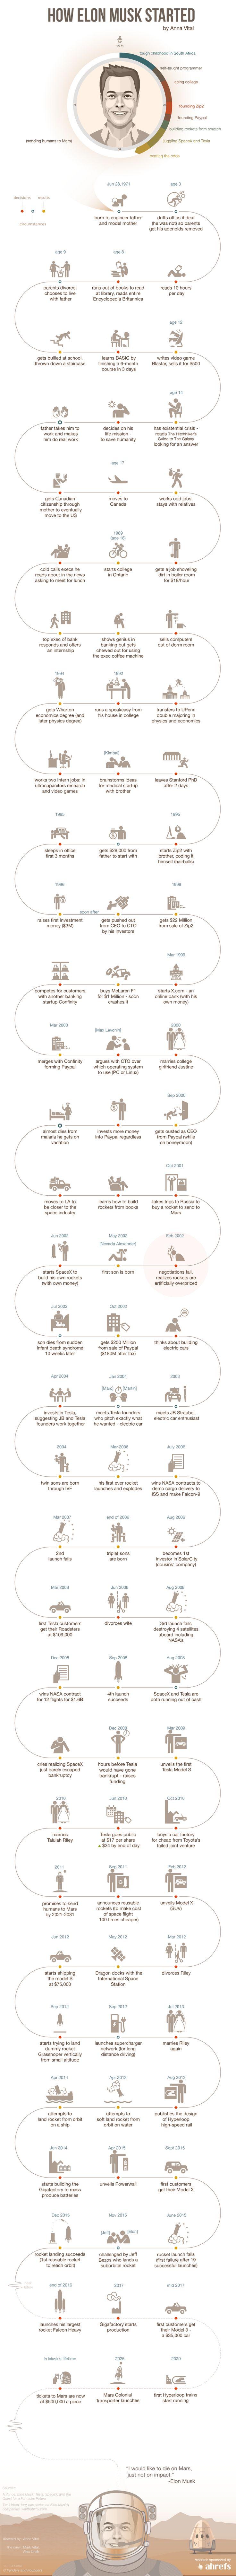 How Elon Musk Built His Net Worth to $12.1 Billion